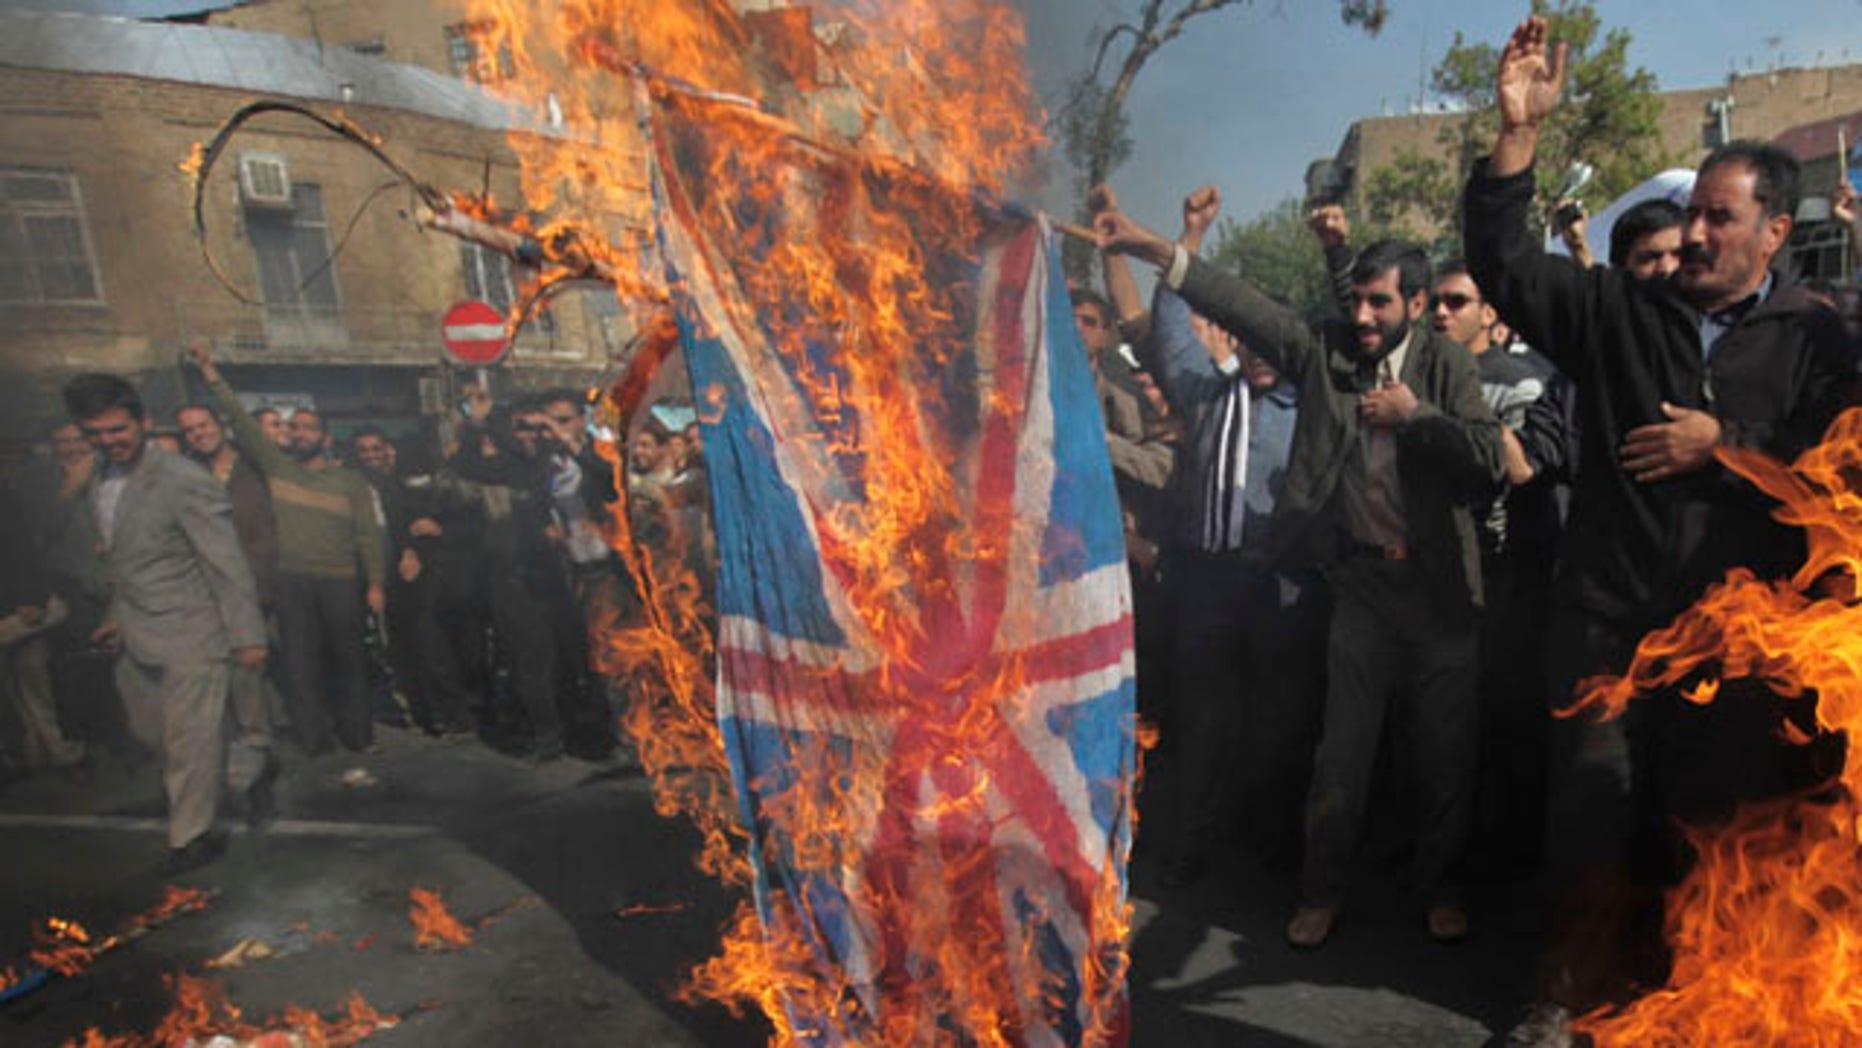 Nov. 4: Iranian  protestors burn representative of the British flag during an anti-British demonstration in front of the British Embassy in Tehran, Iran.